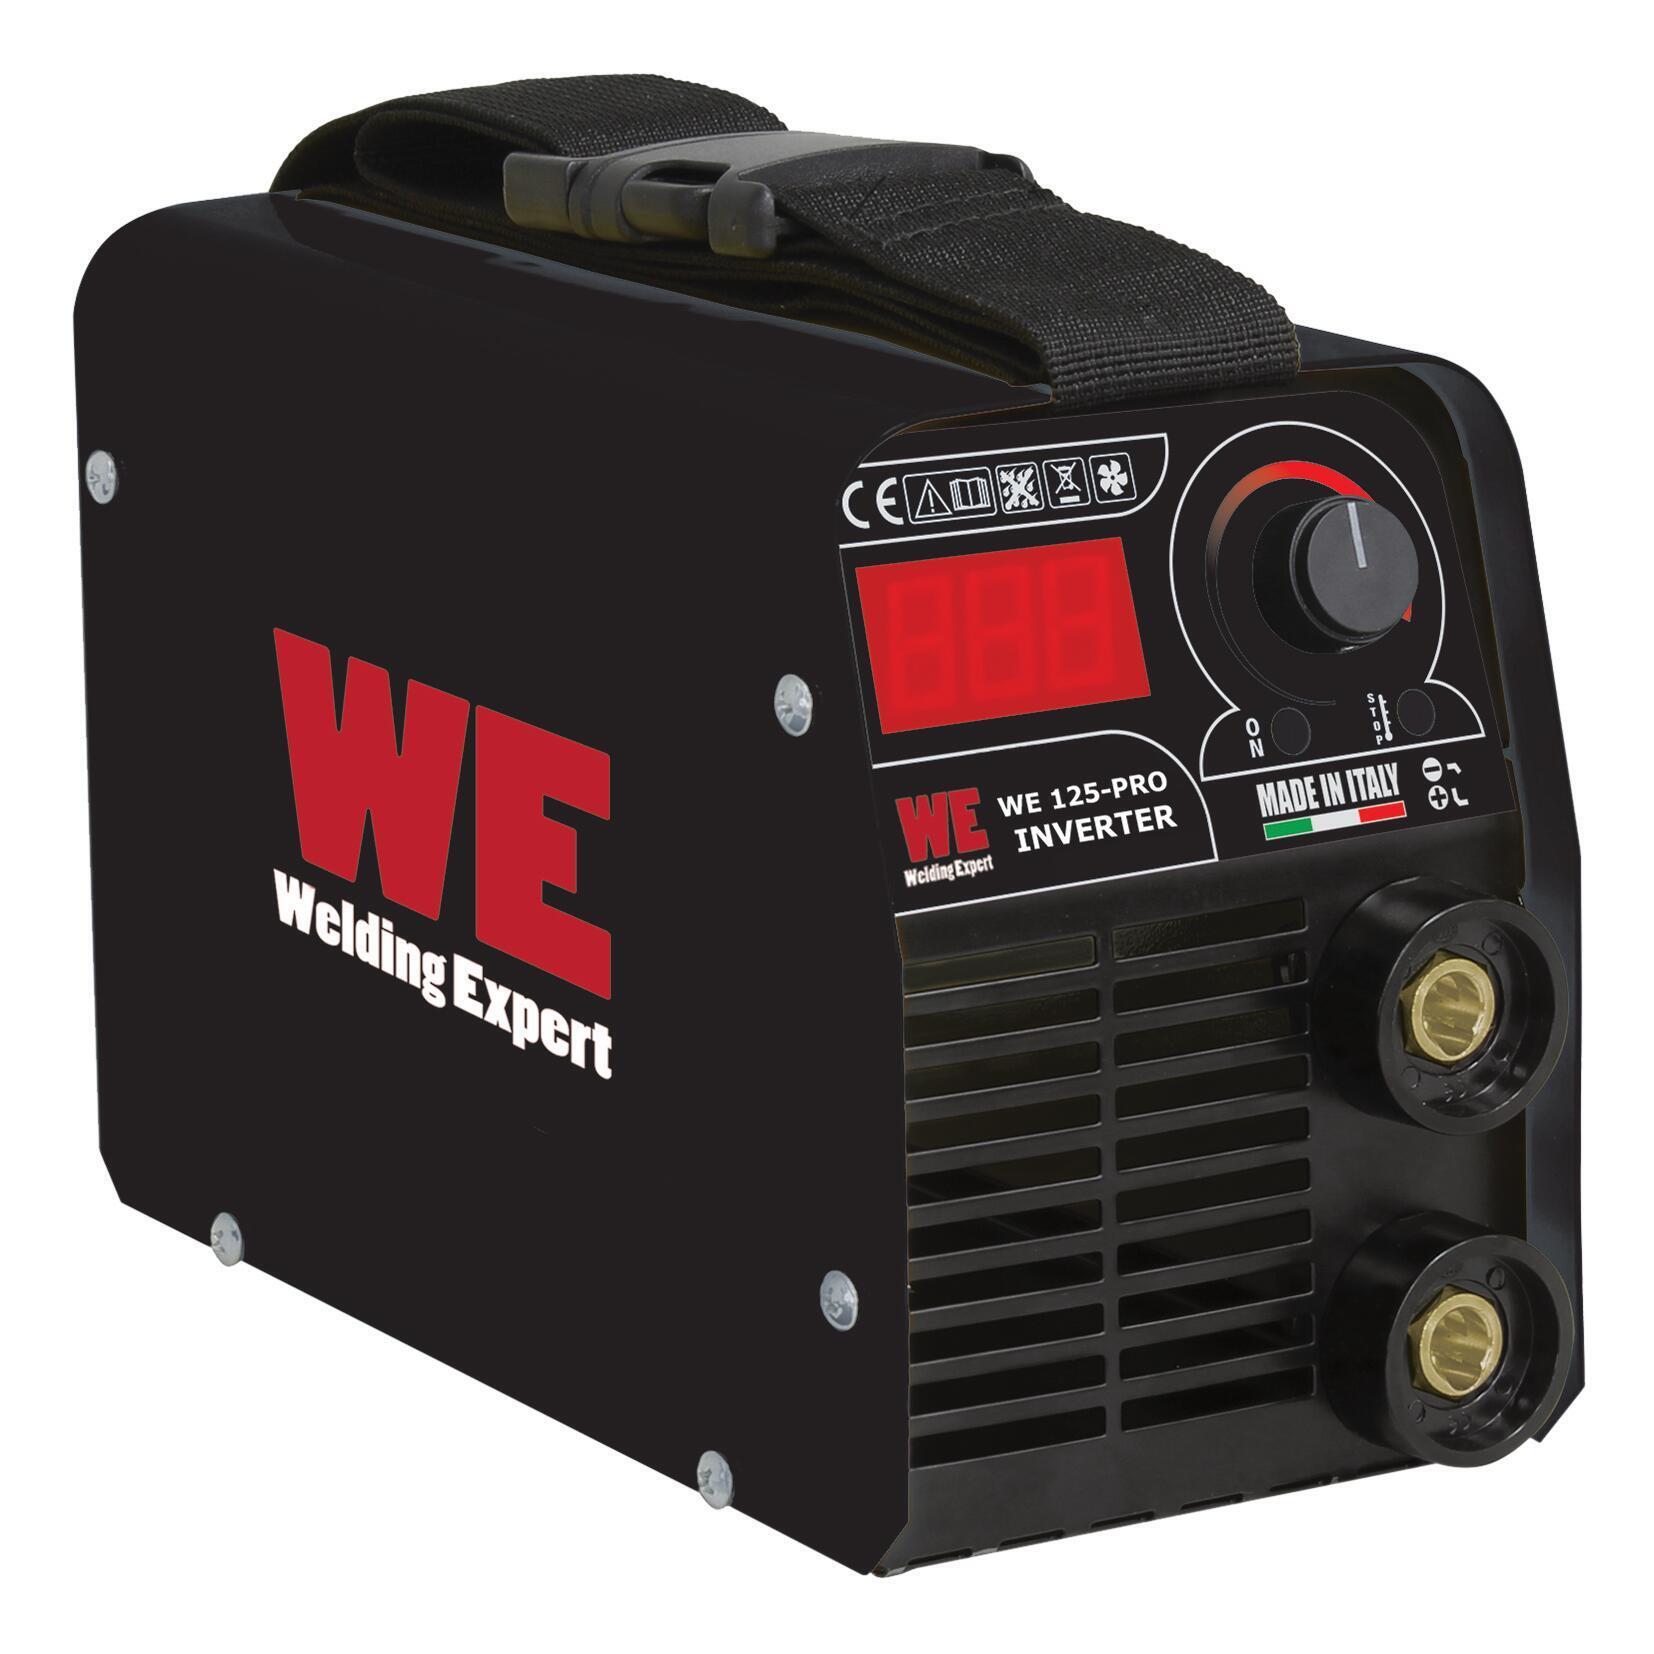 Saldatrice inverter WE 125 PRO mma 125 A 4200 W - 1